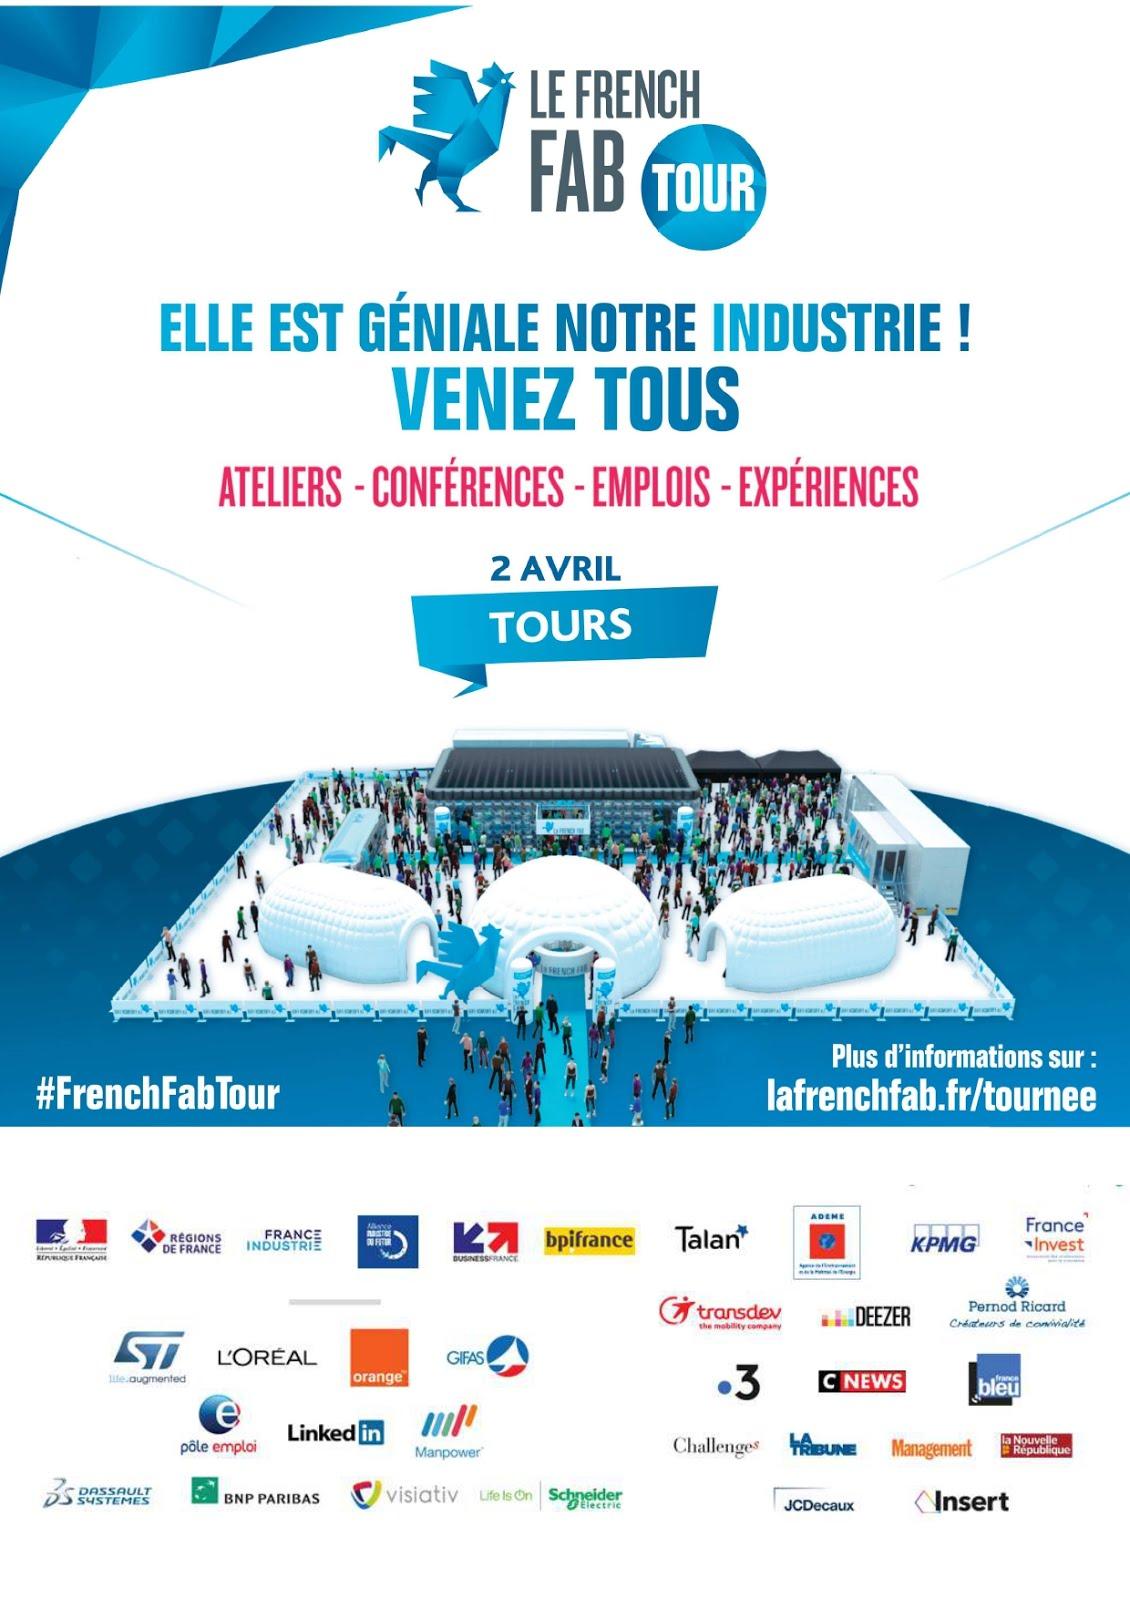 #FrenchFabTour